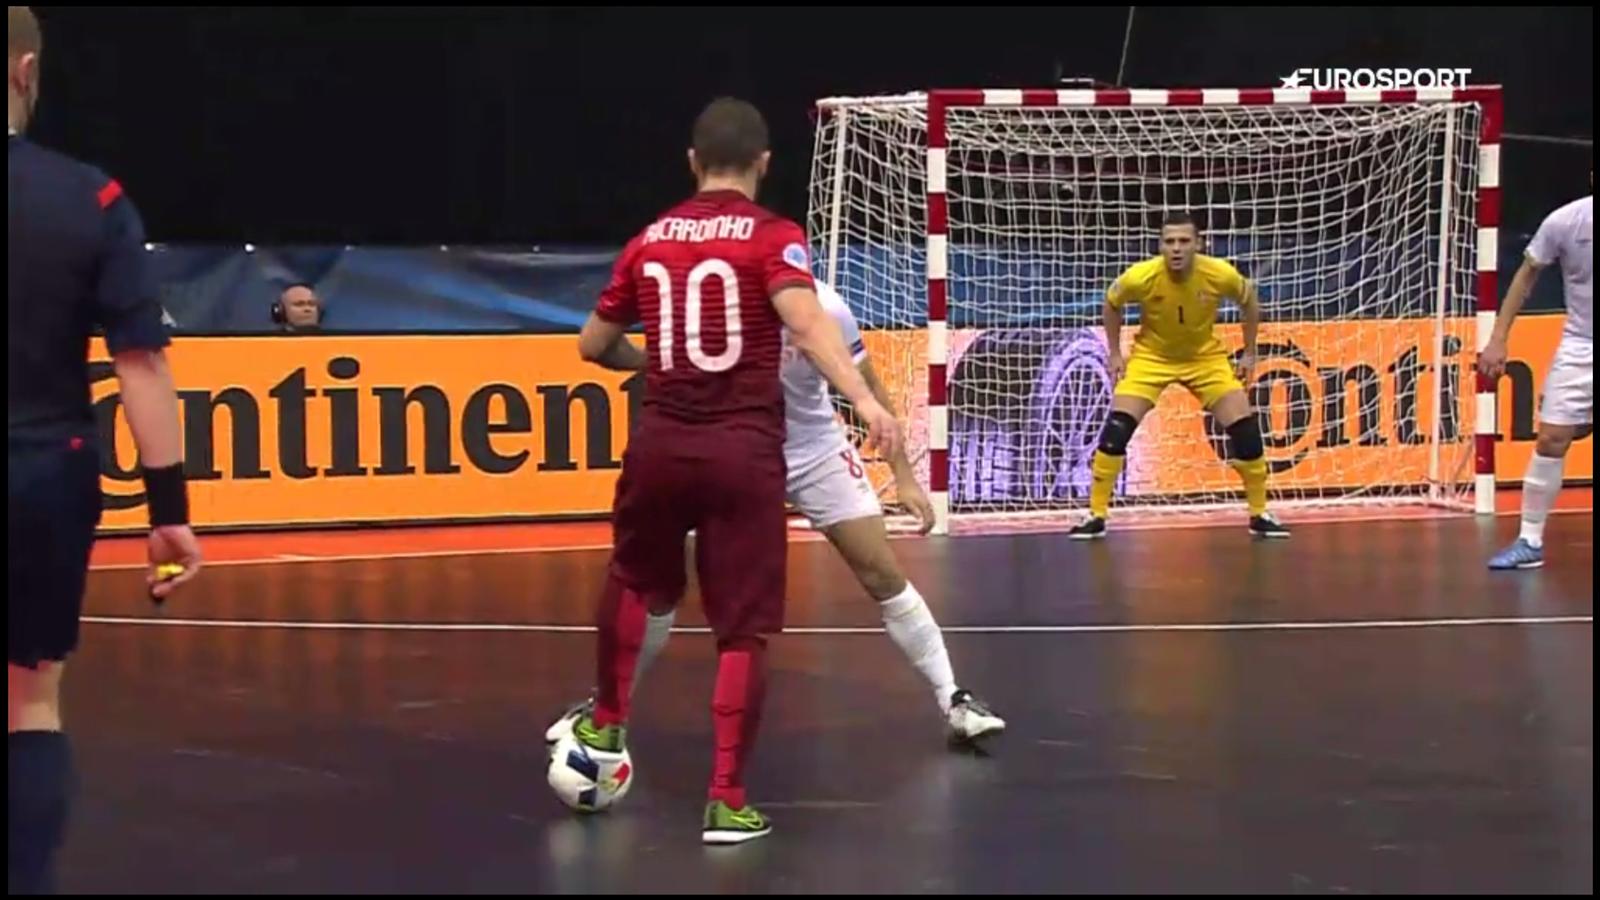 VIDEO - Portugal star Ricardinho scores epic goal at Euro 2016 Futsal - Video Eurosport UK